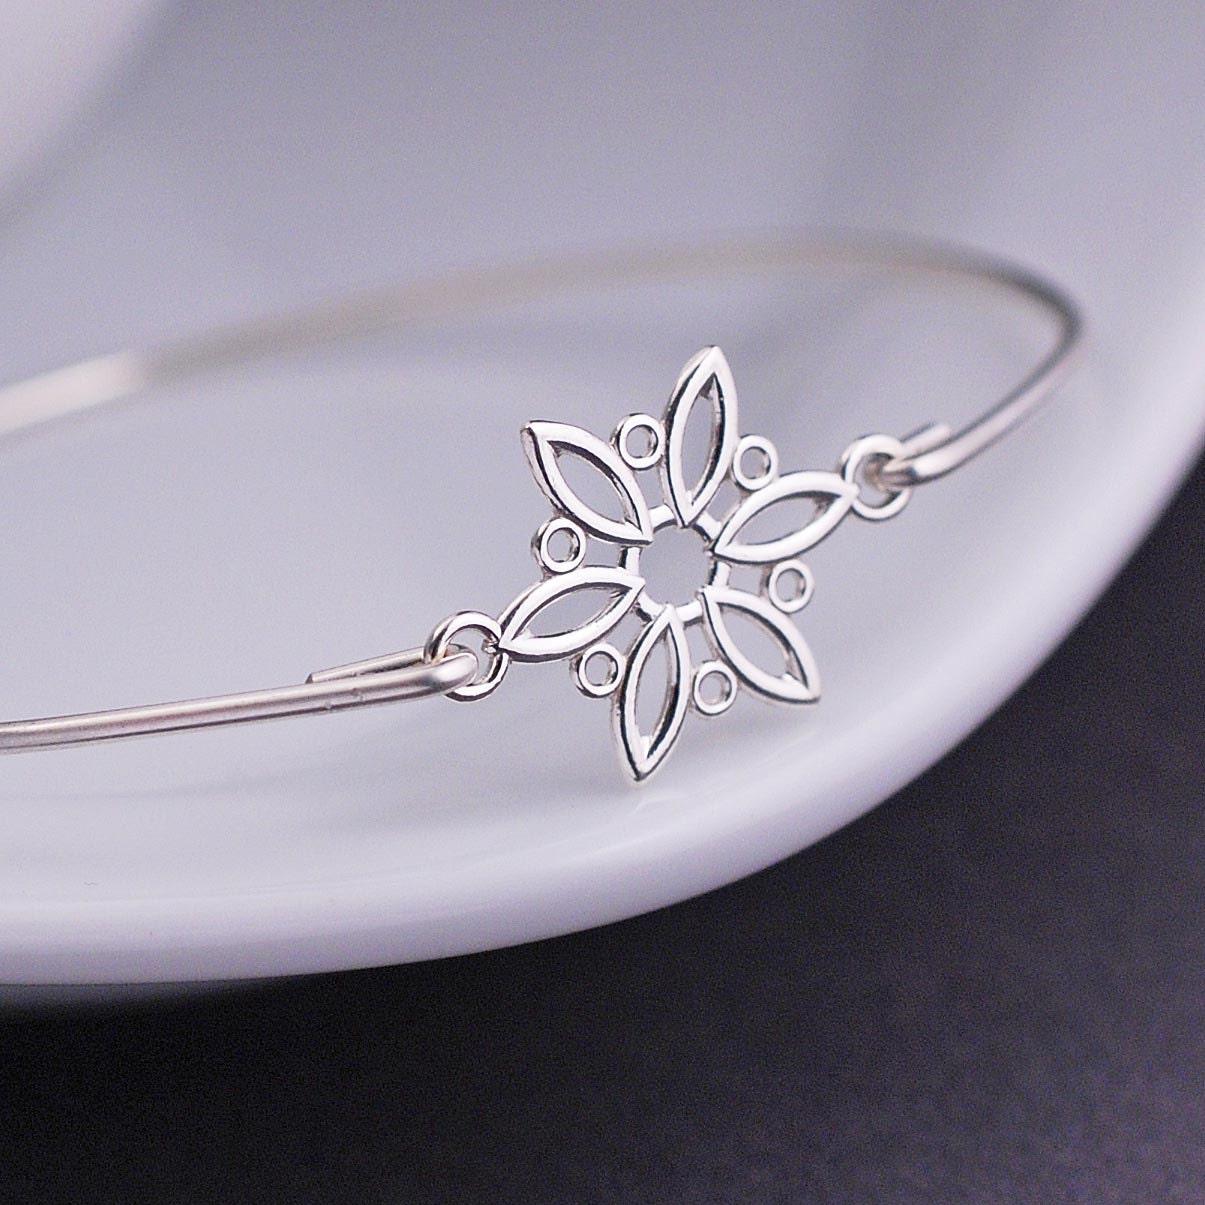 Snowflake Charm Bracelet: Snowflake Bracelet Winter Fashion Snowflake Jewelry